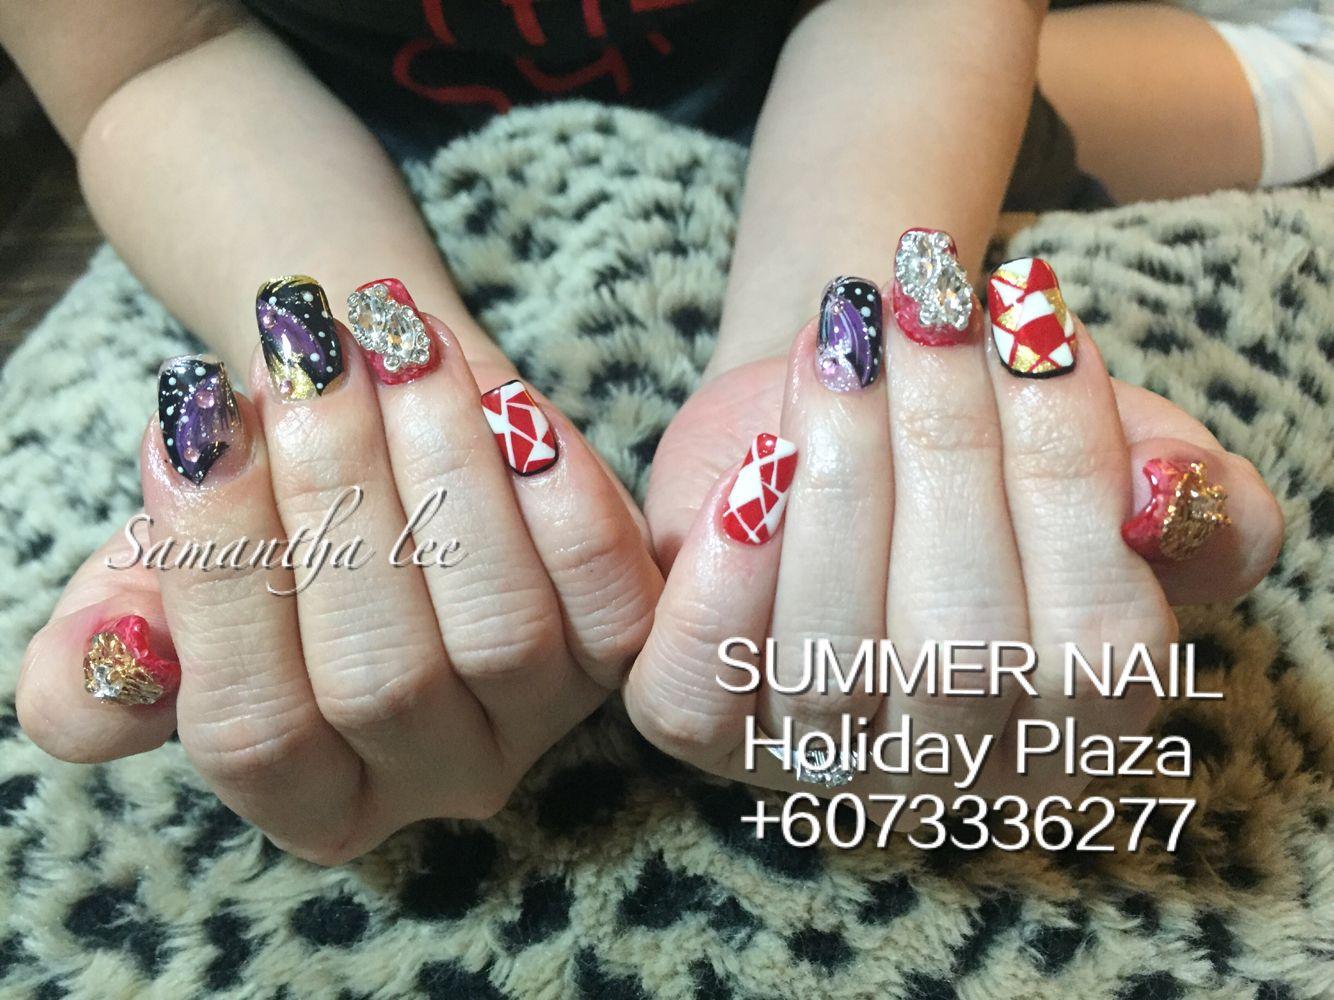 Summer Nail Holiday Plaza Mcdonald S Upstairs 3rd Floor 6073336277 Whatsapp 60163188359 Instagram Summernai Gel Pedicure Gel Manicure Artificial Nails